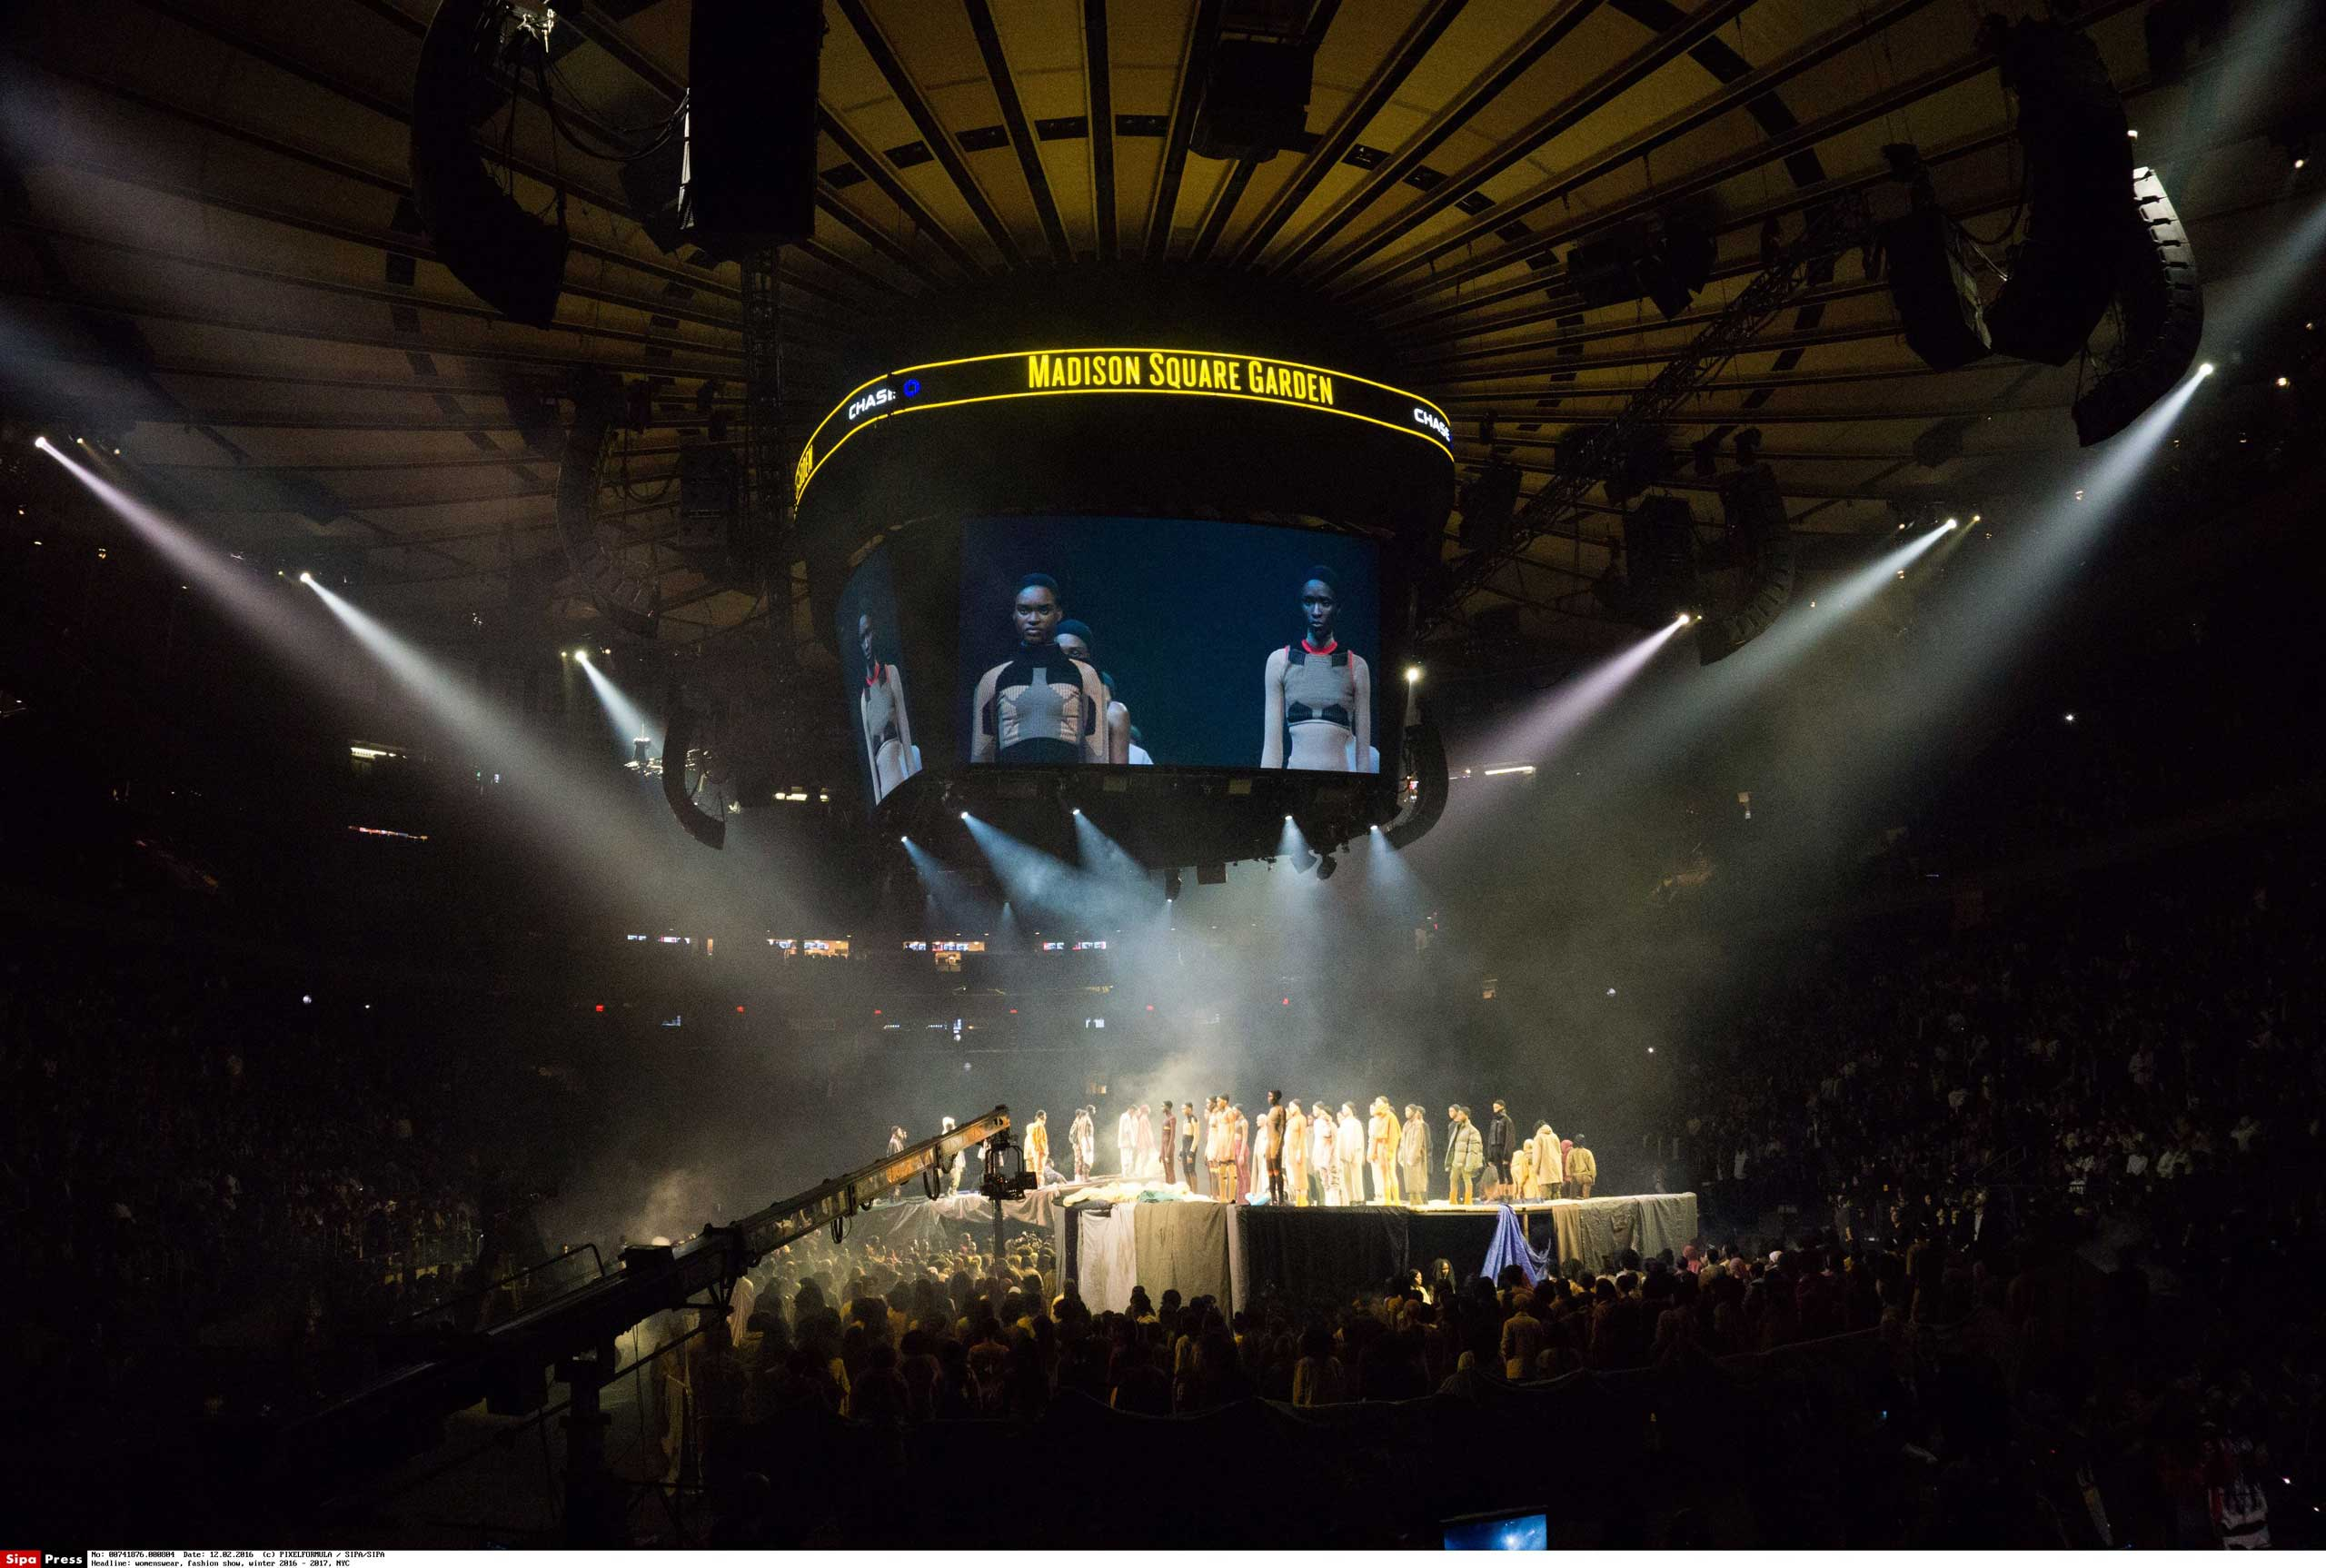 Kanye West's Yeezy Season 3 fashion show at Madison Square Garden, Feb. 11, 2016.